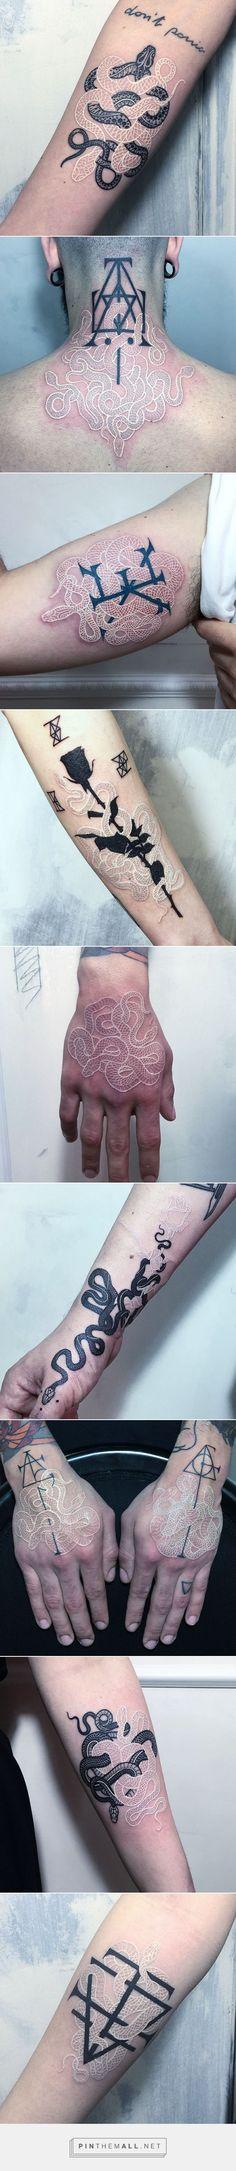 Black And White Snake Tattoos By Mirko Sata   Bored Panda - created via https://pinthemall.net